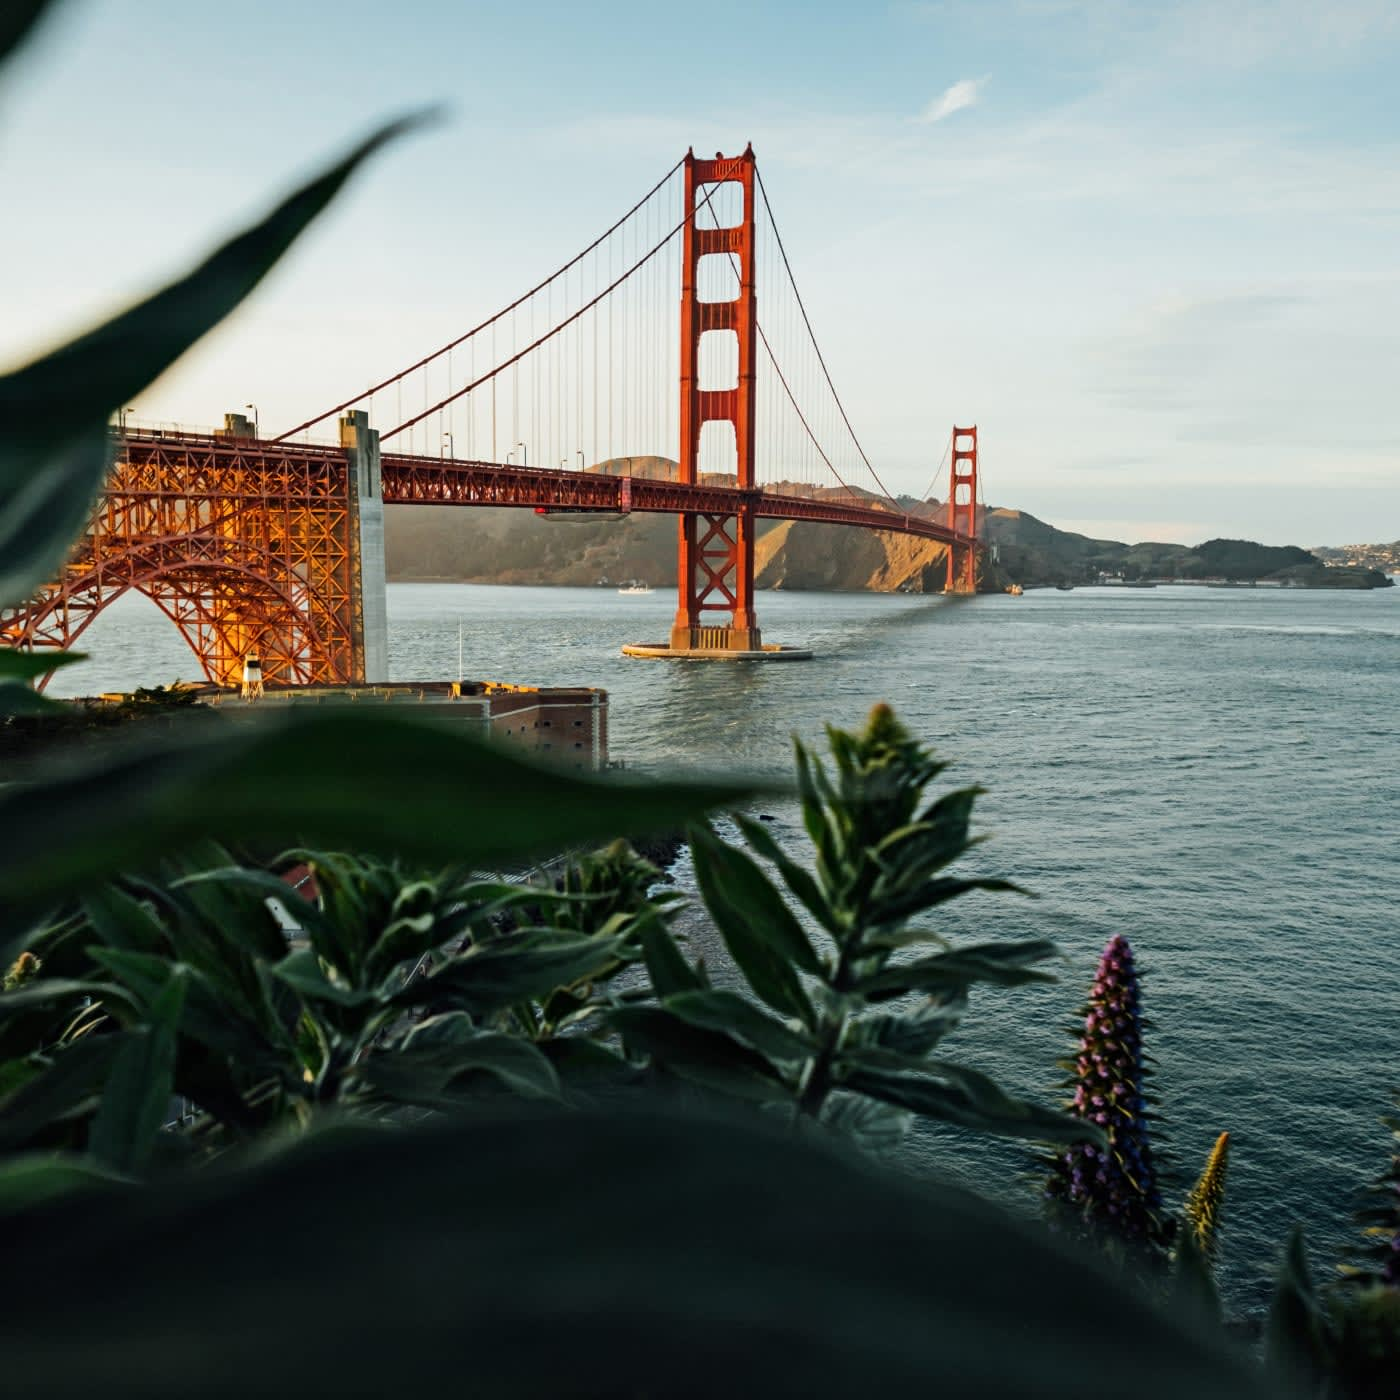 San Francisco image